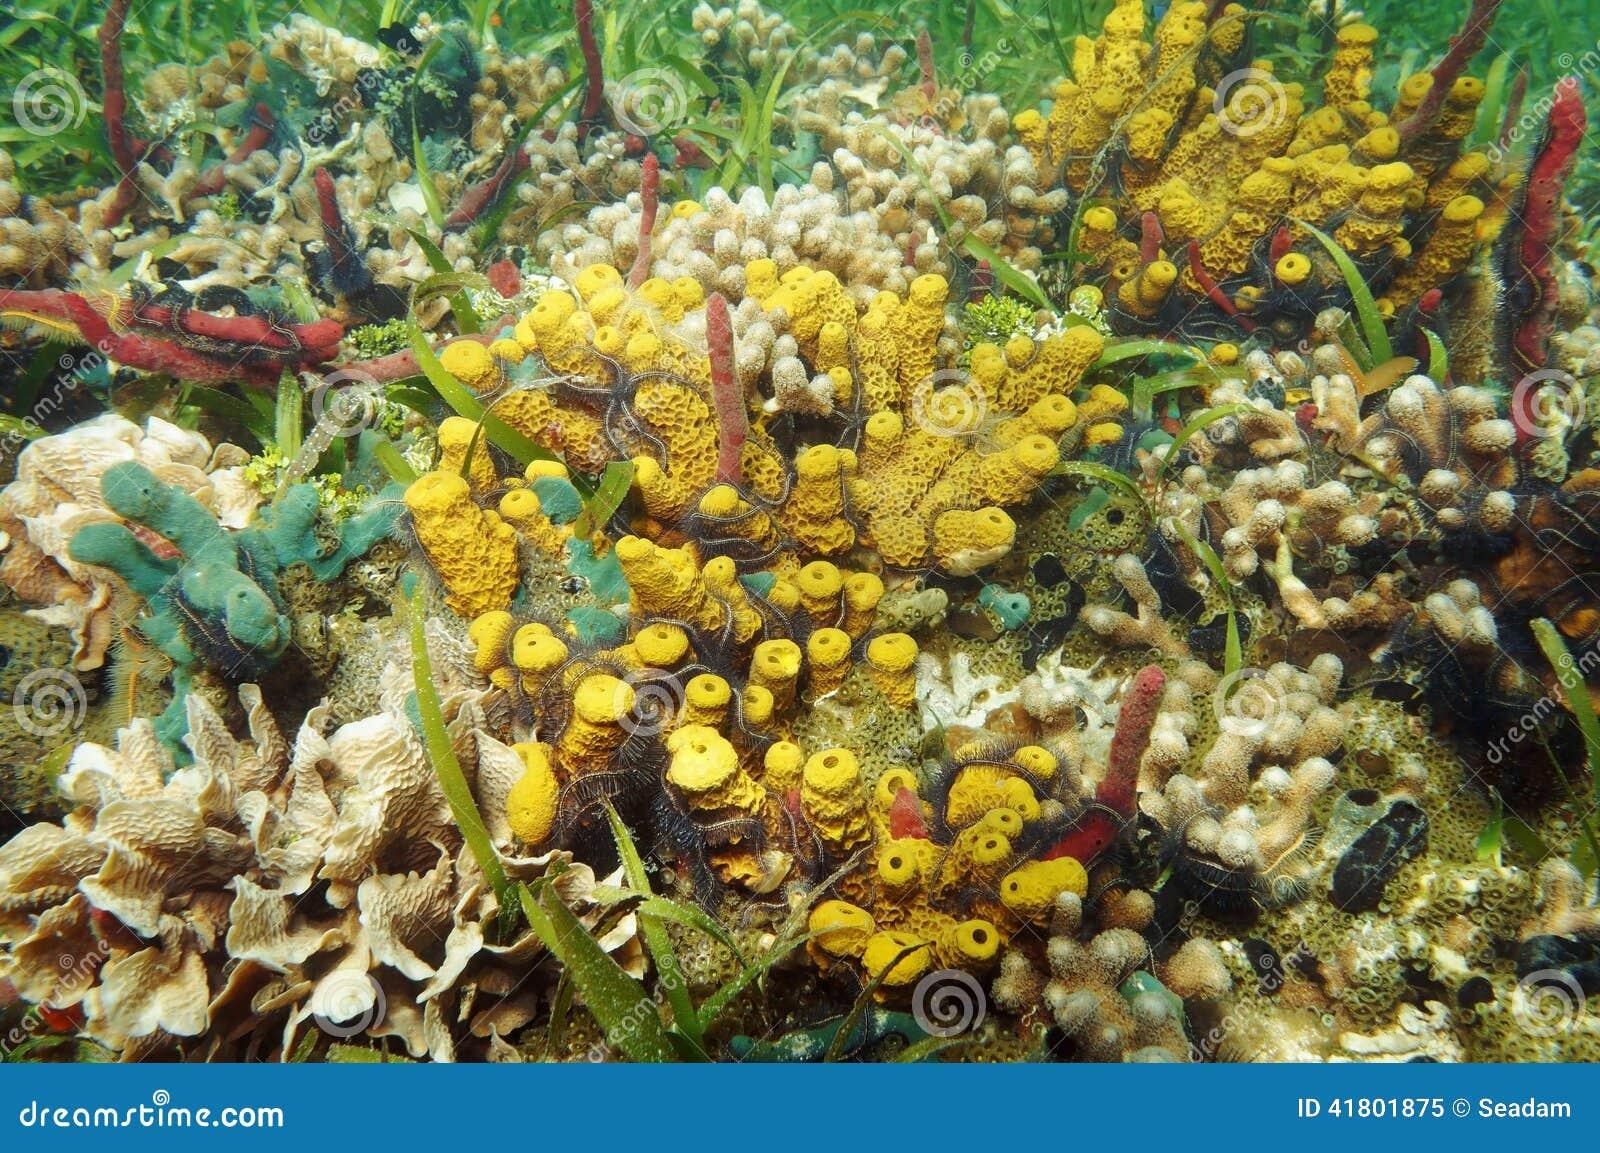 Caribbean Sea Animal Life: Colorful Underwater Marine Life Of Caribbean Sea Stock